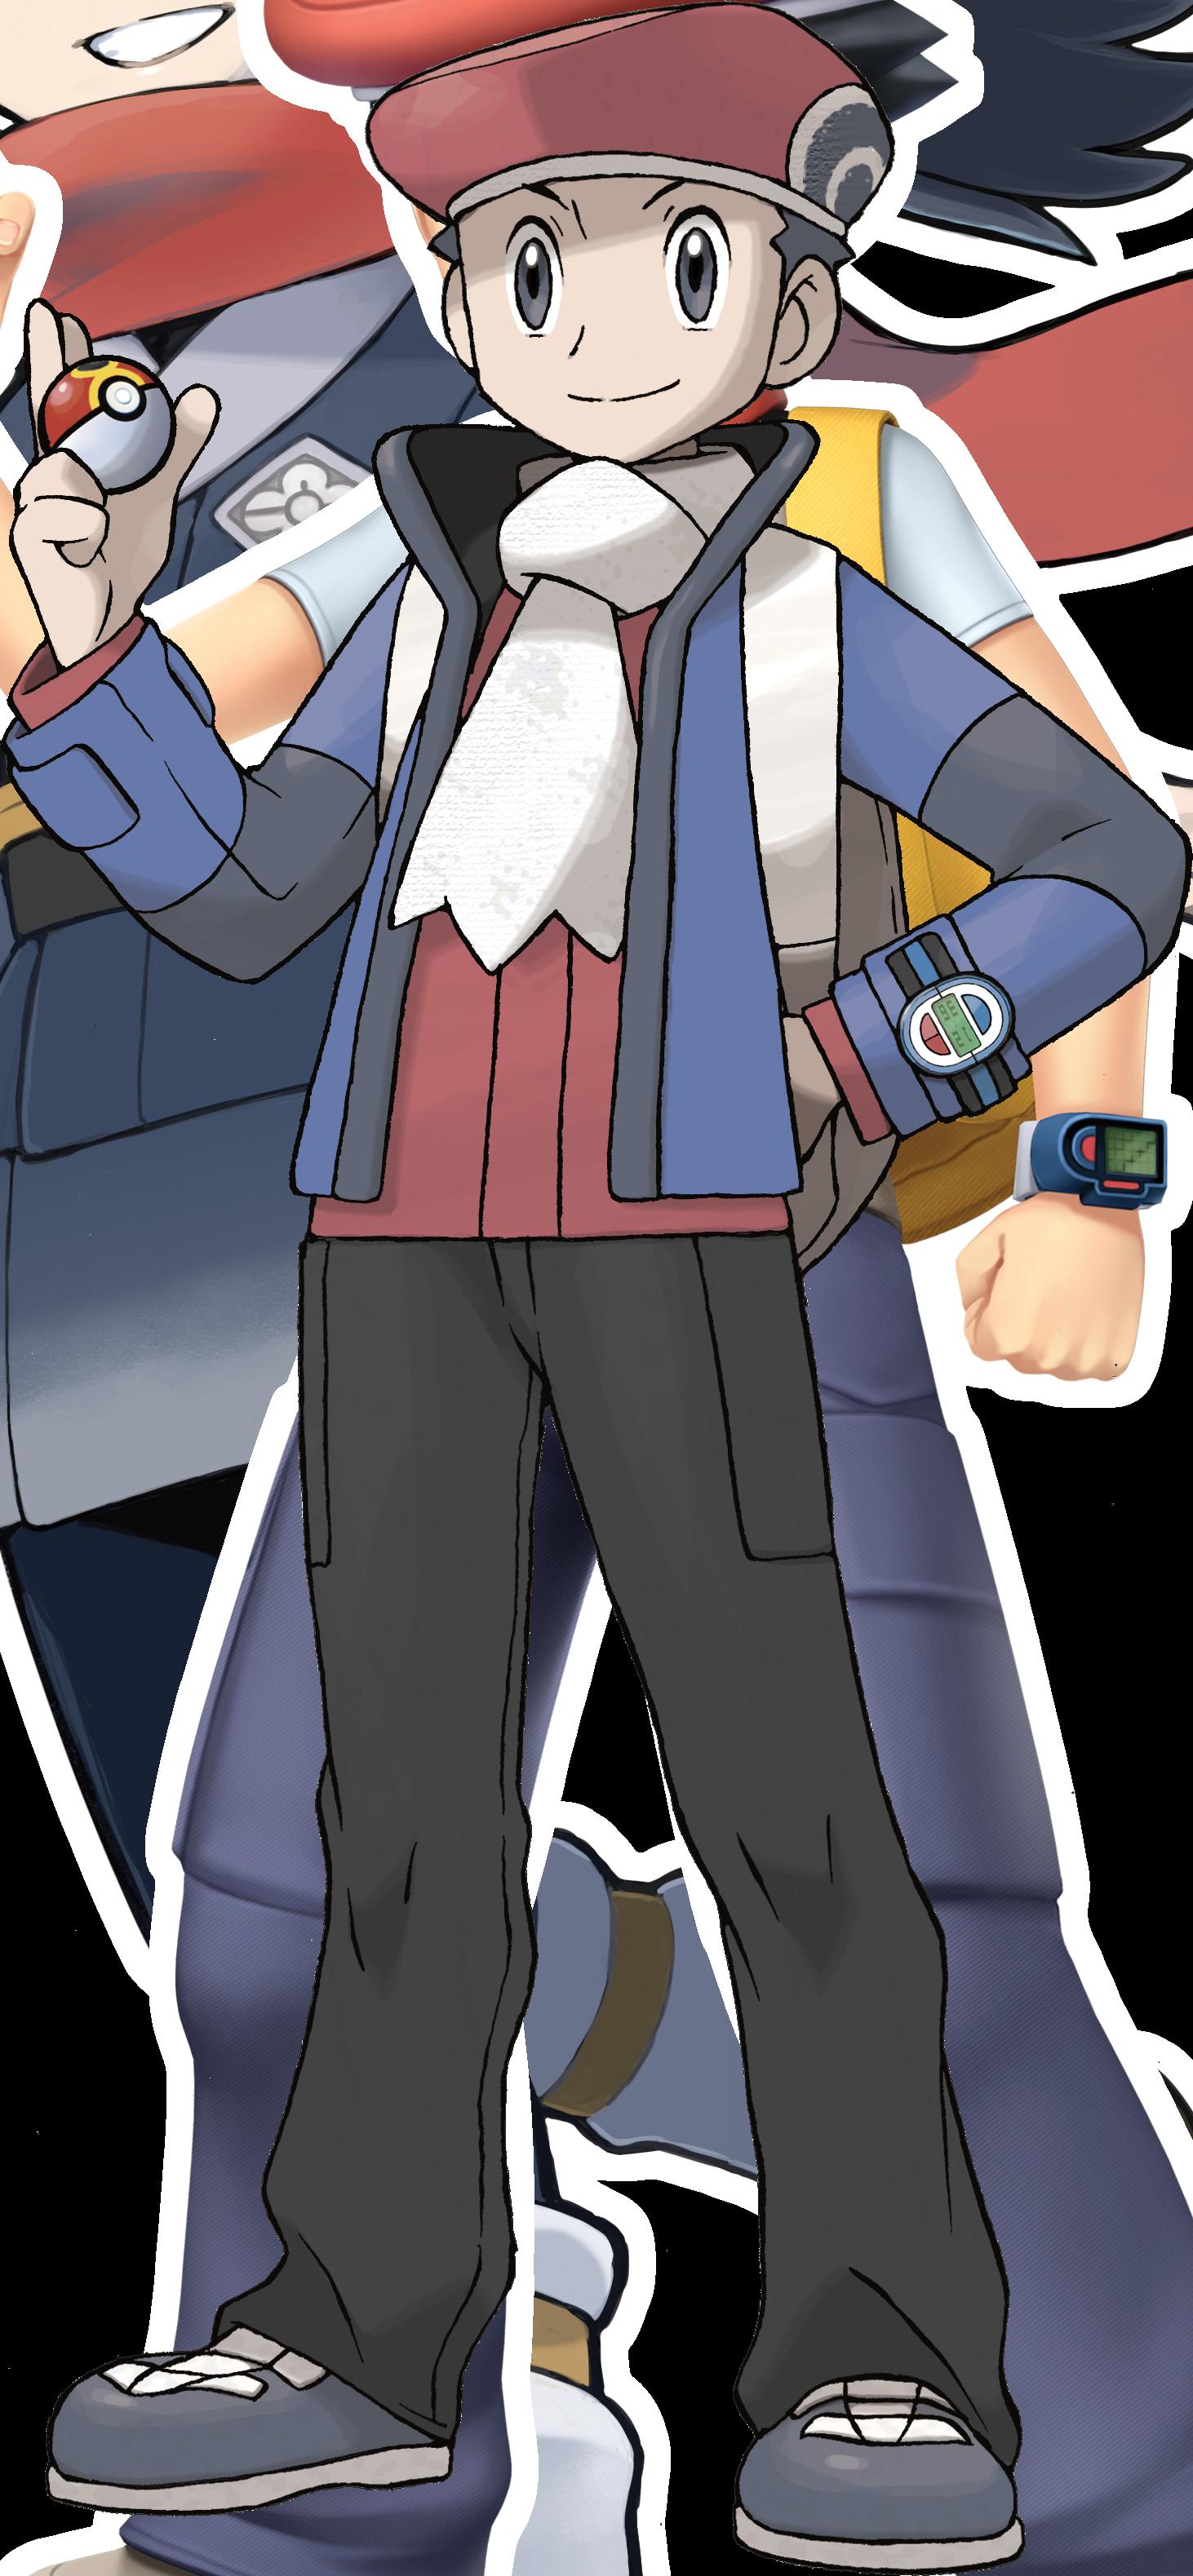 Lucas (Pokémon)